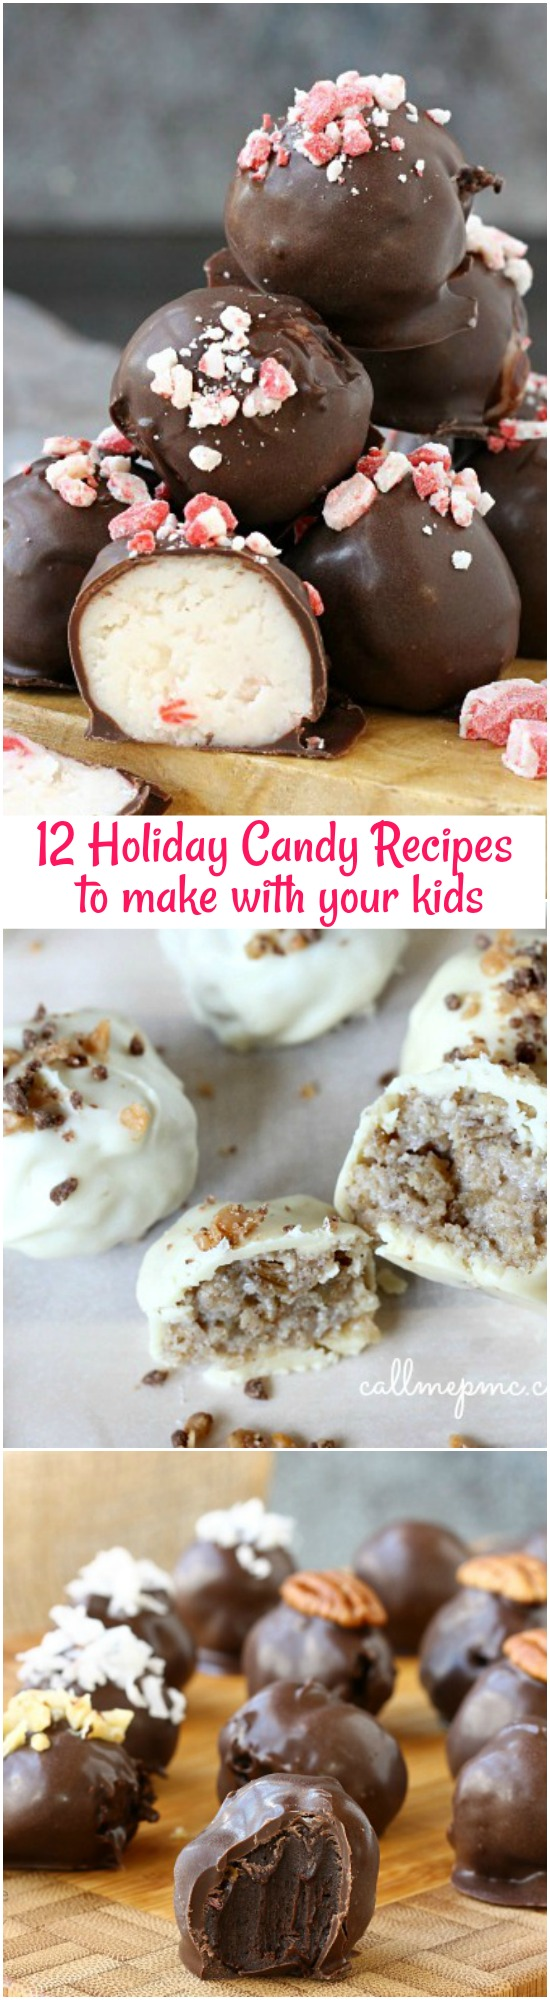 12 Holiday Candy Recipes